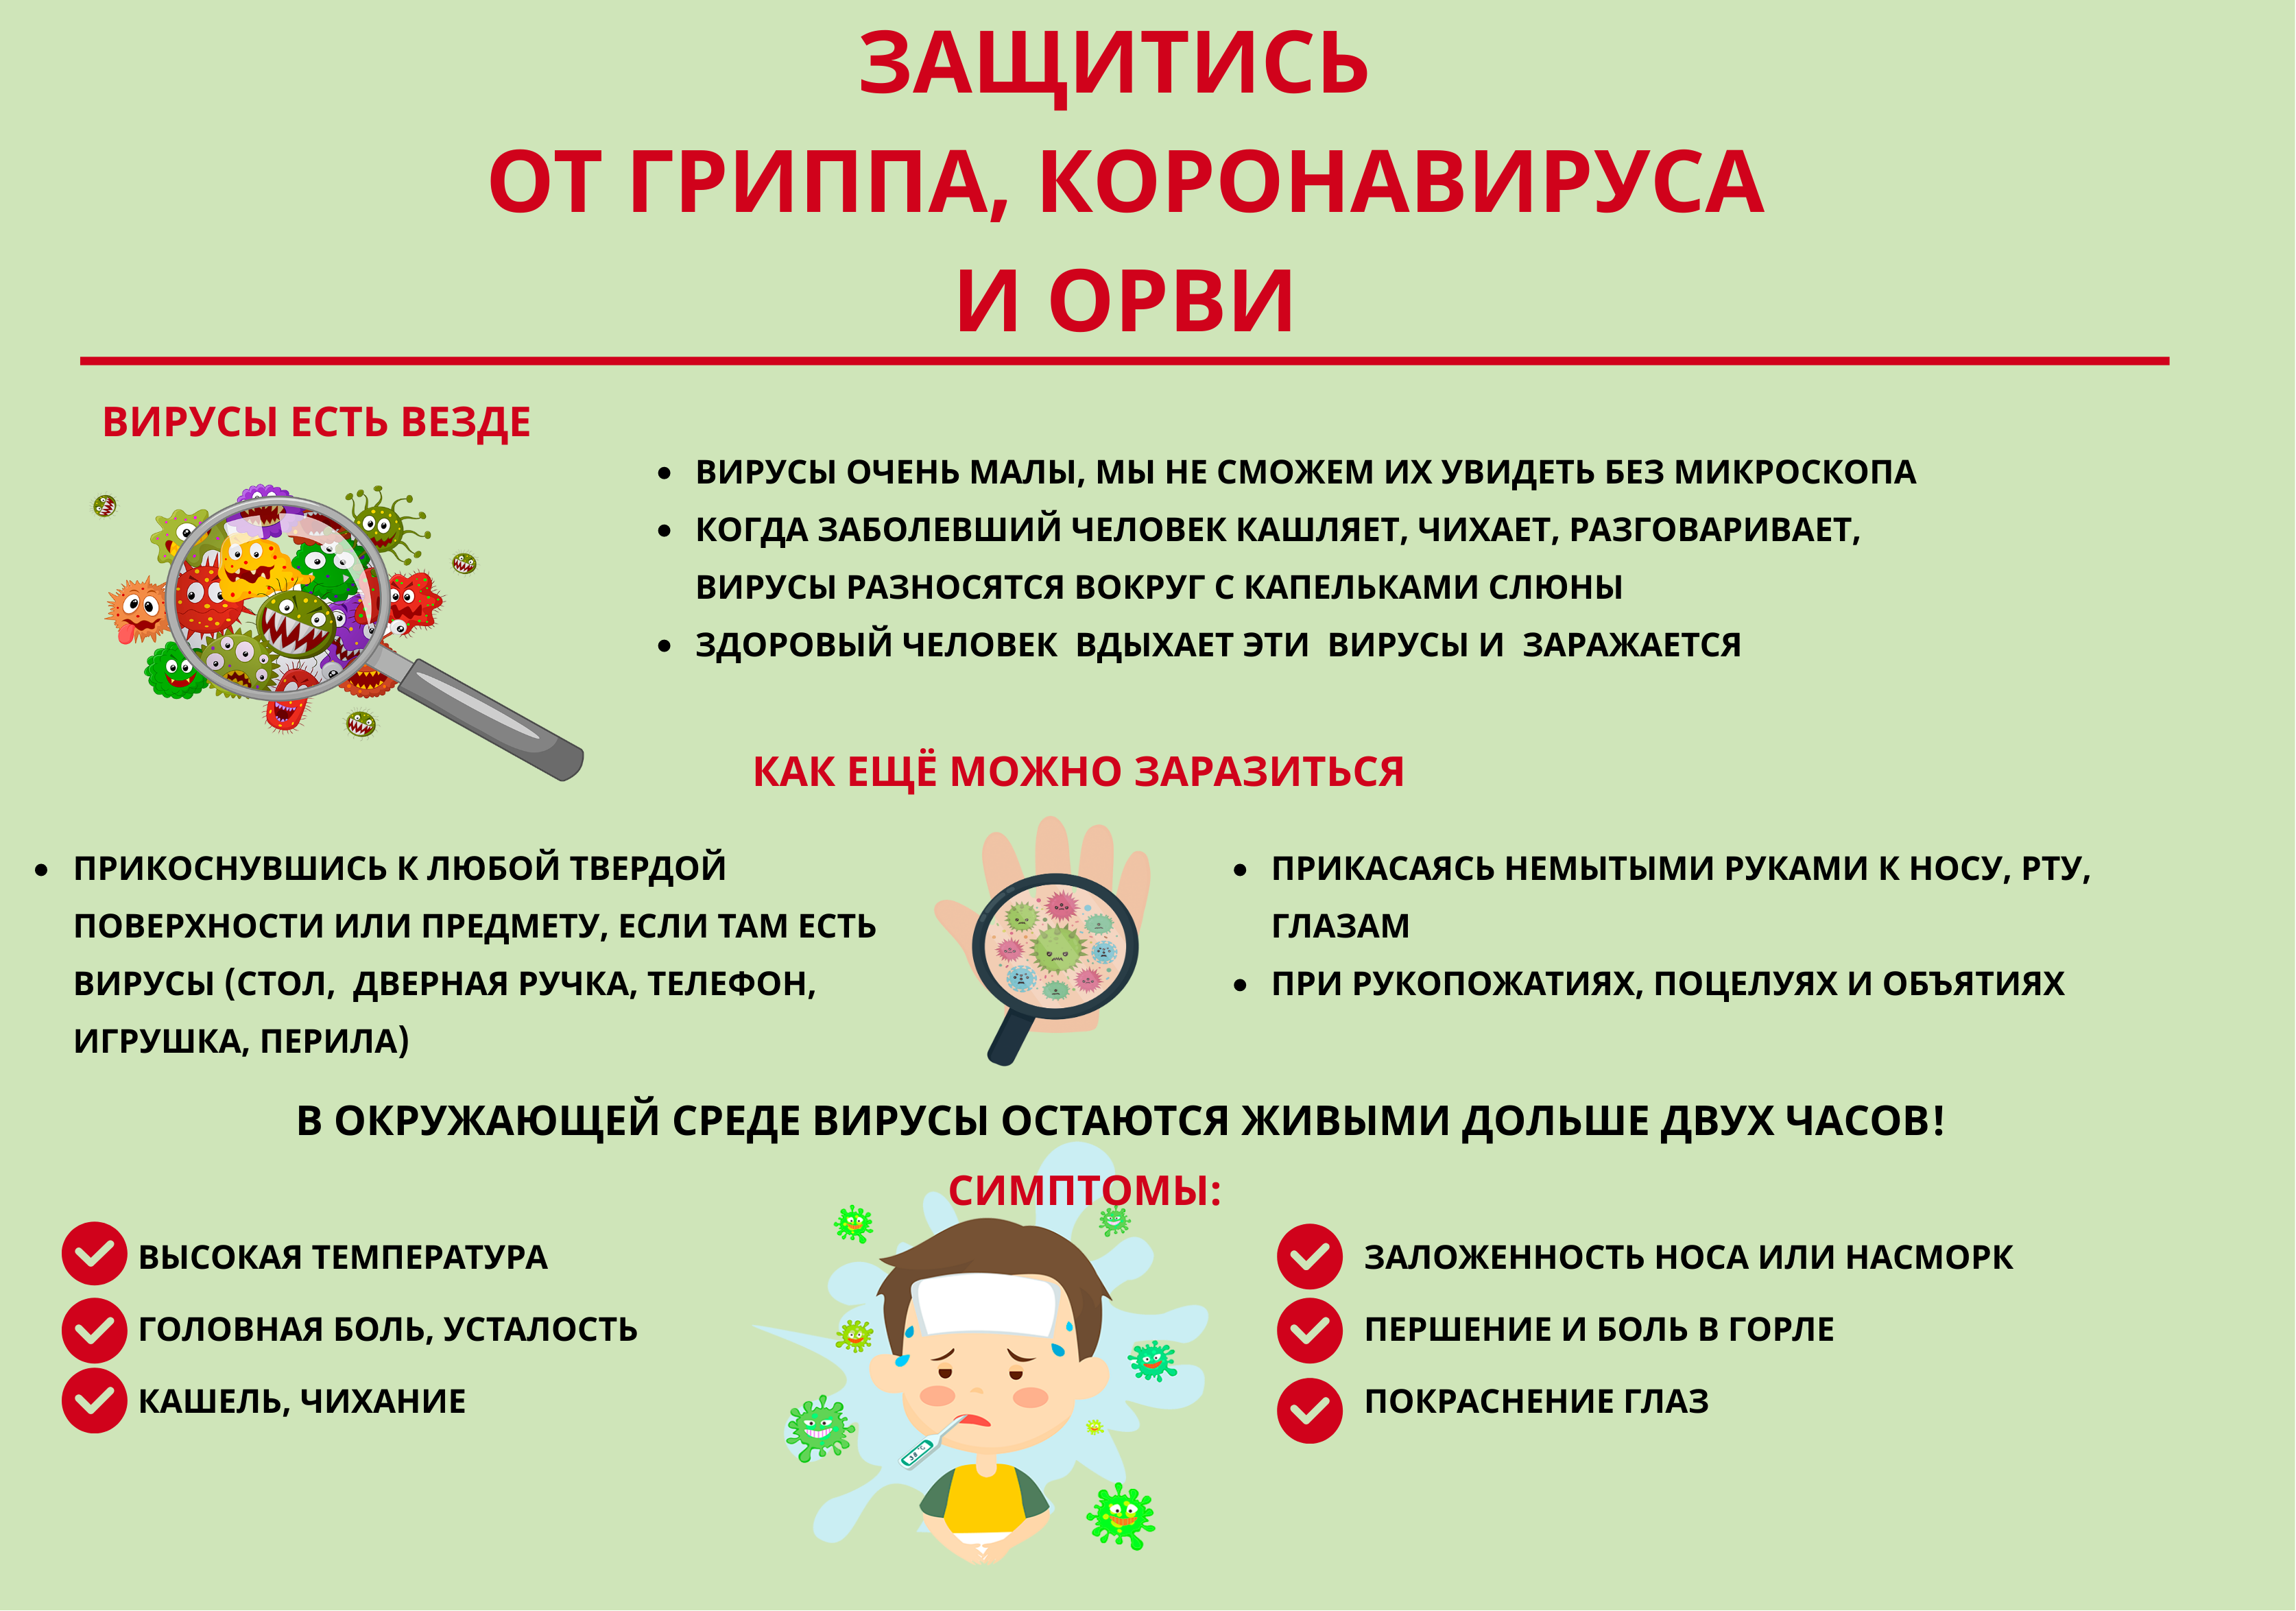 Гигиена при гриппе, коронавирусной инфекции и других ОРВИ.